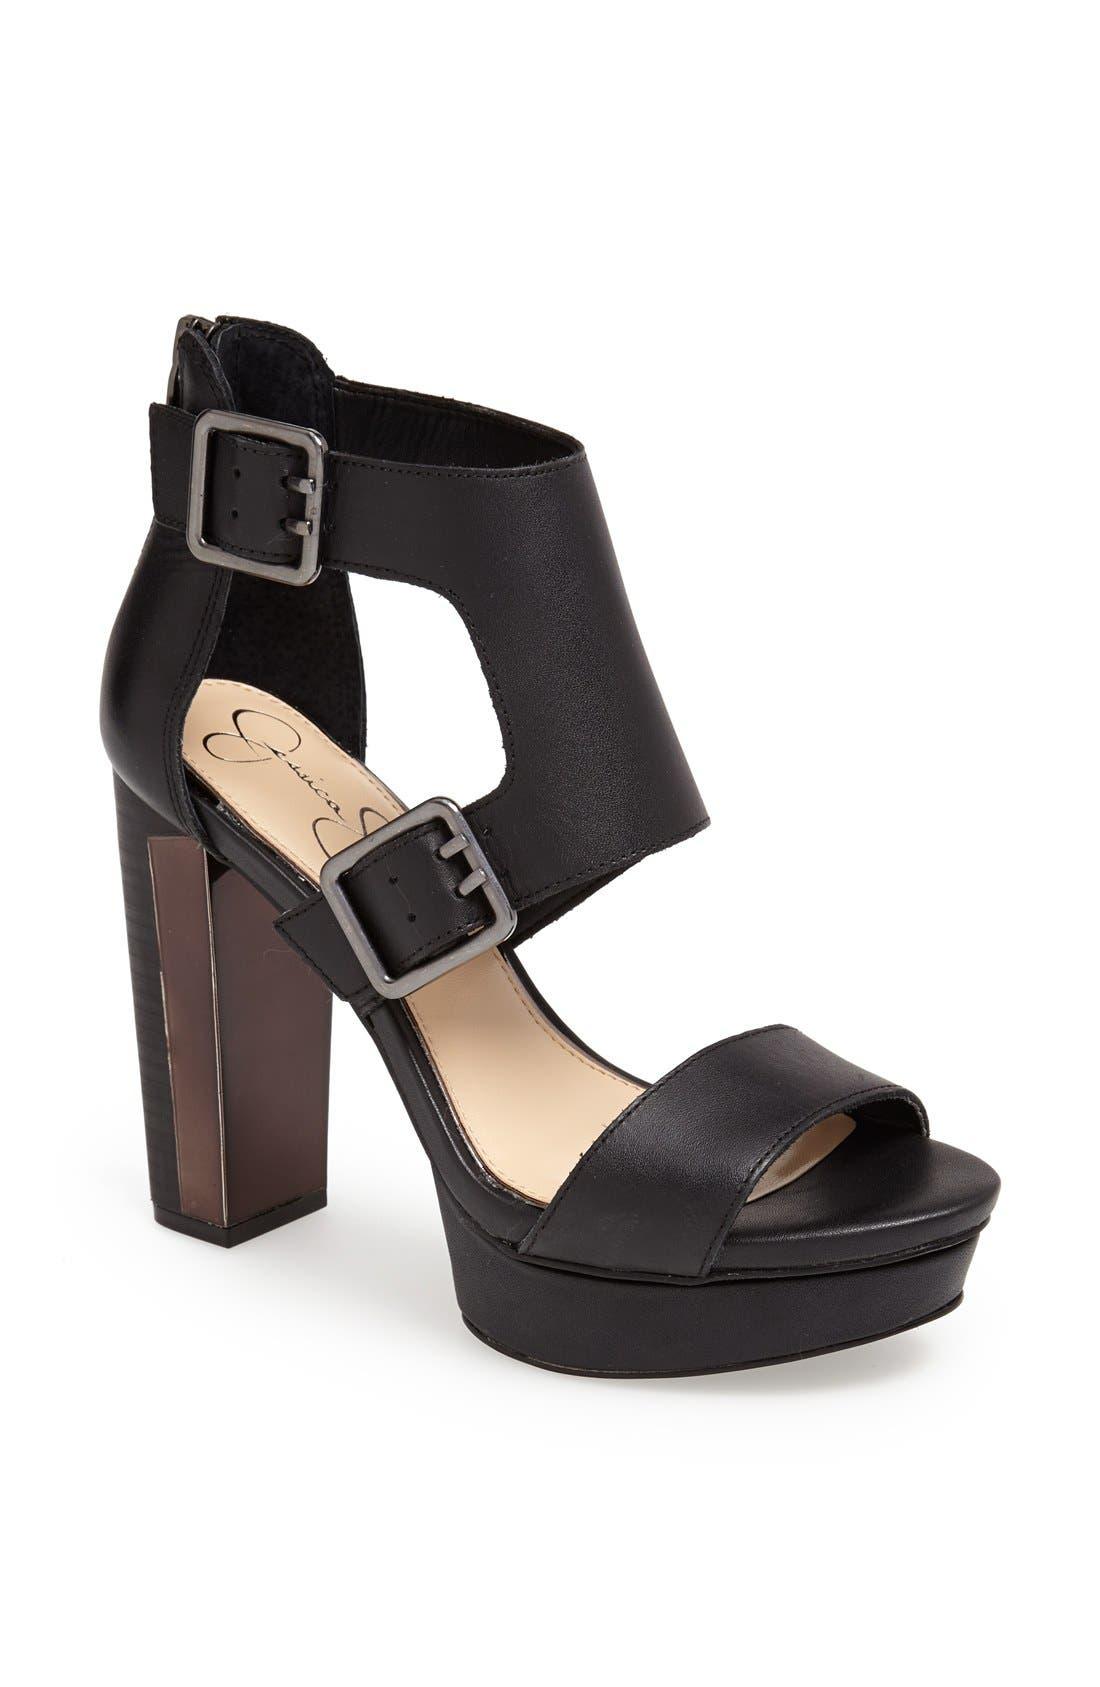 Alternate Image 1 Selected - Jessica Simpson 'Kaitzz' Sandal